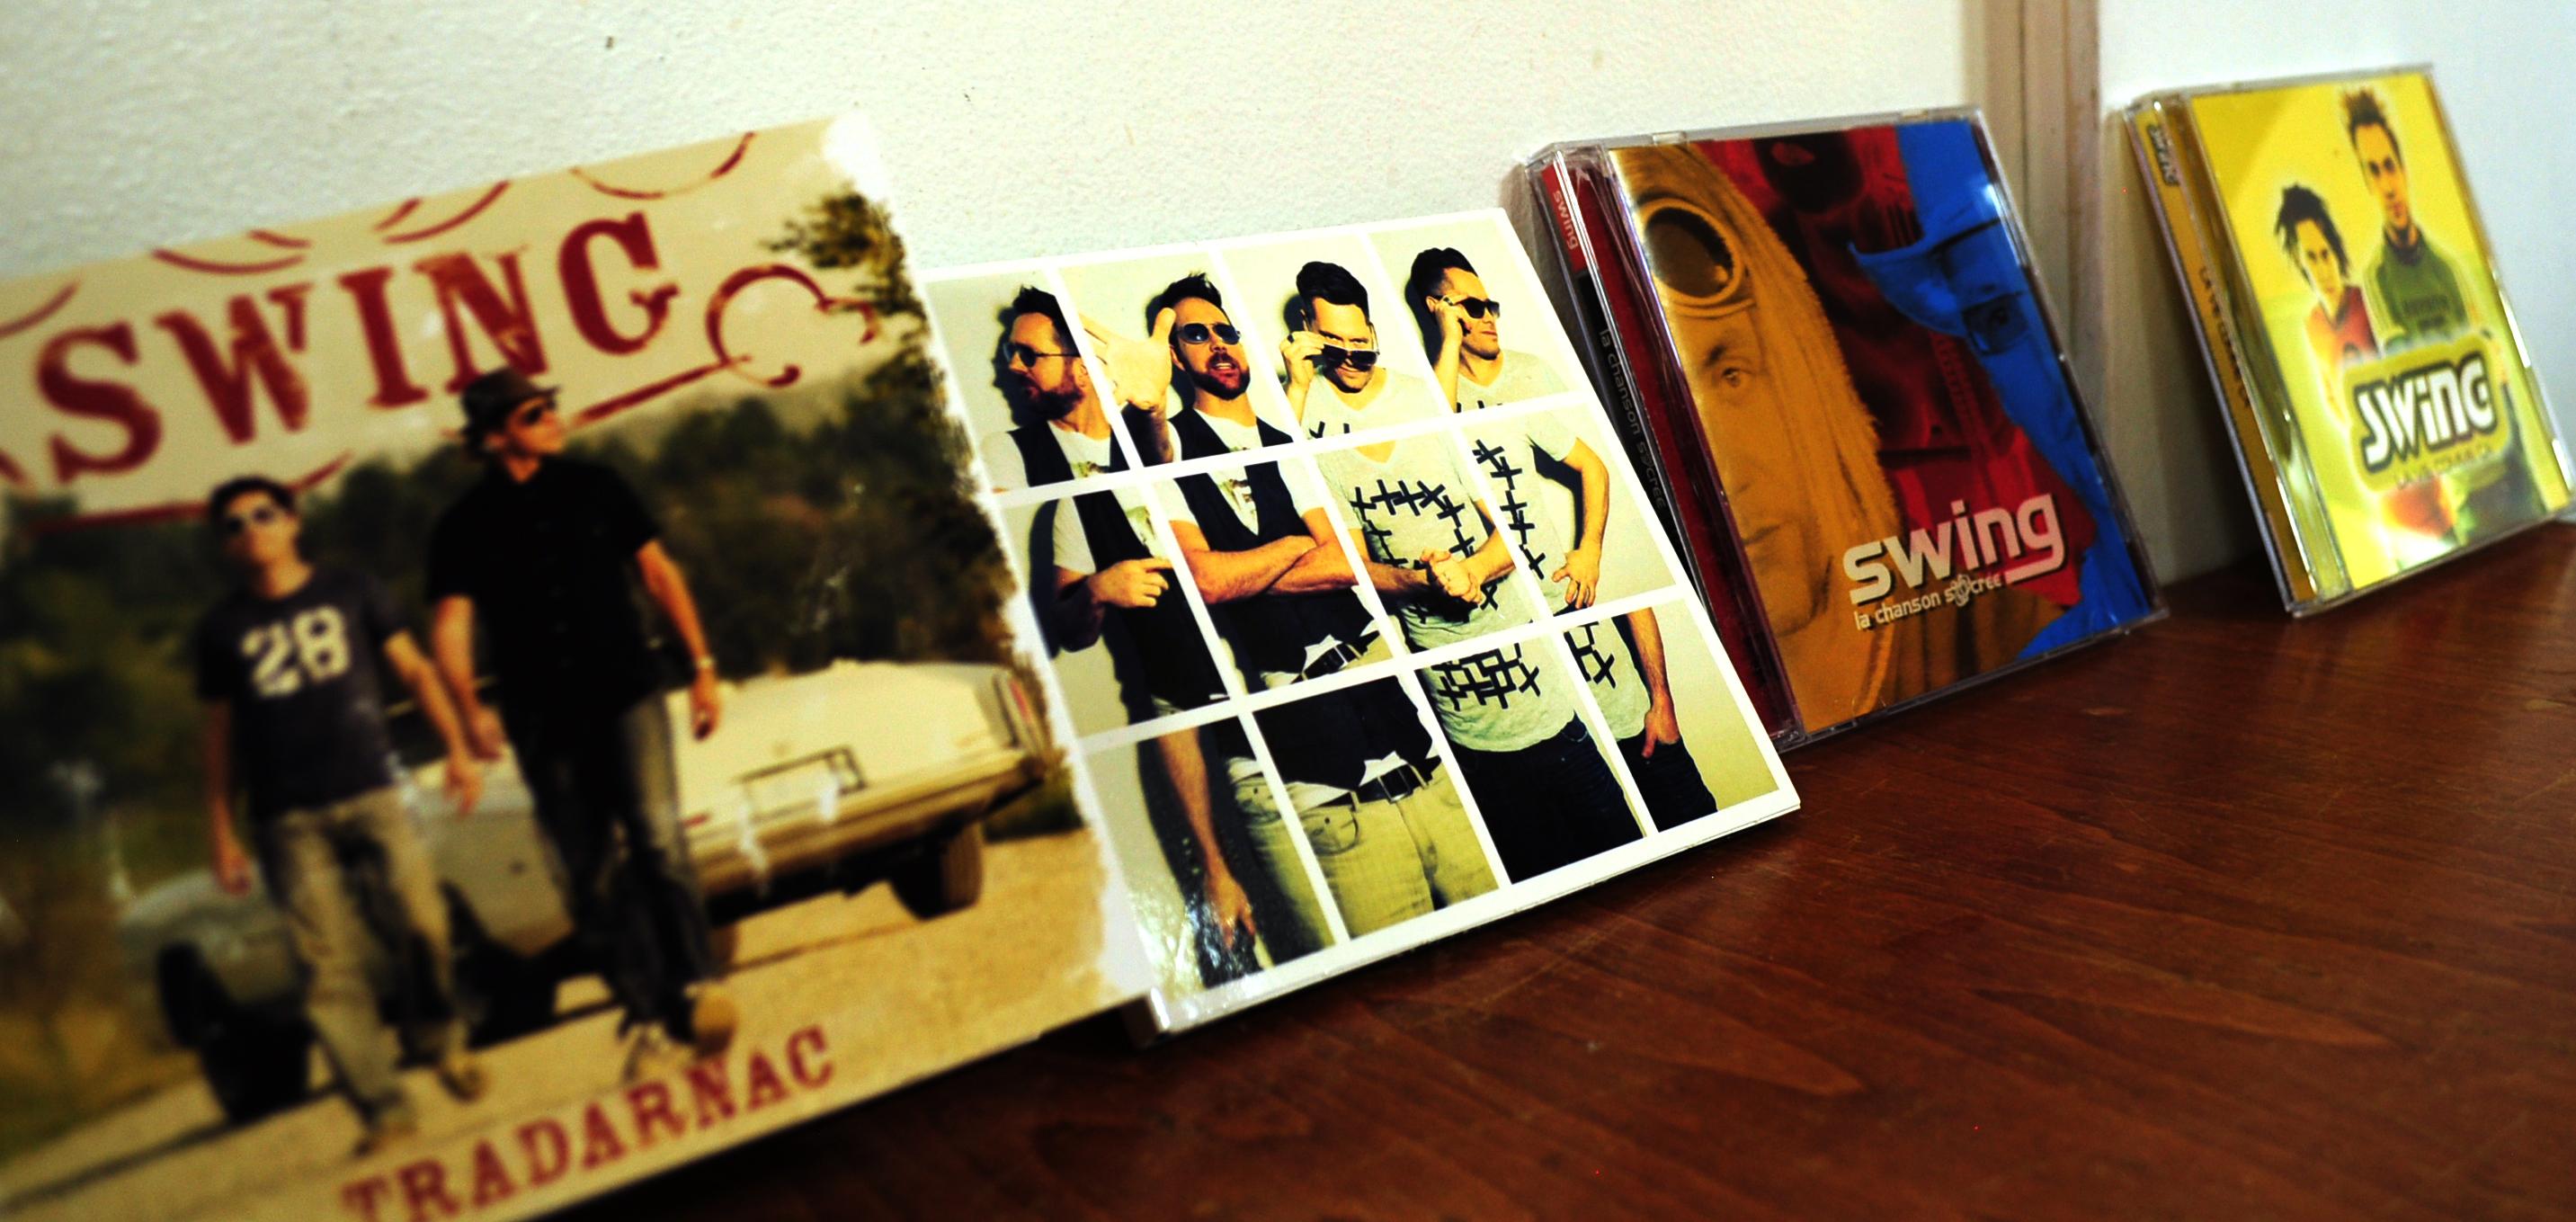 La discographie de Swing. (Photo: Thomson Birara)